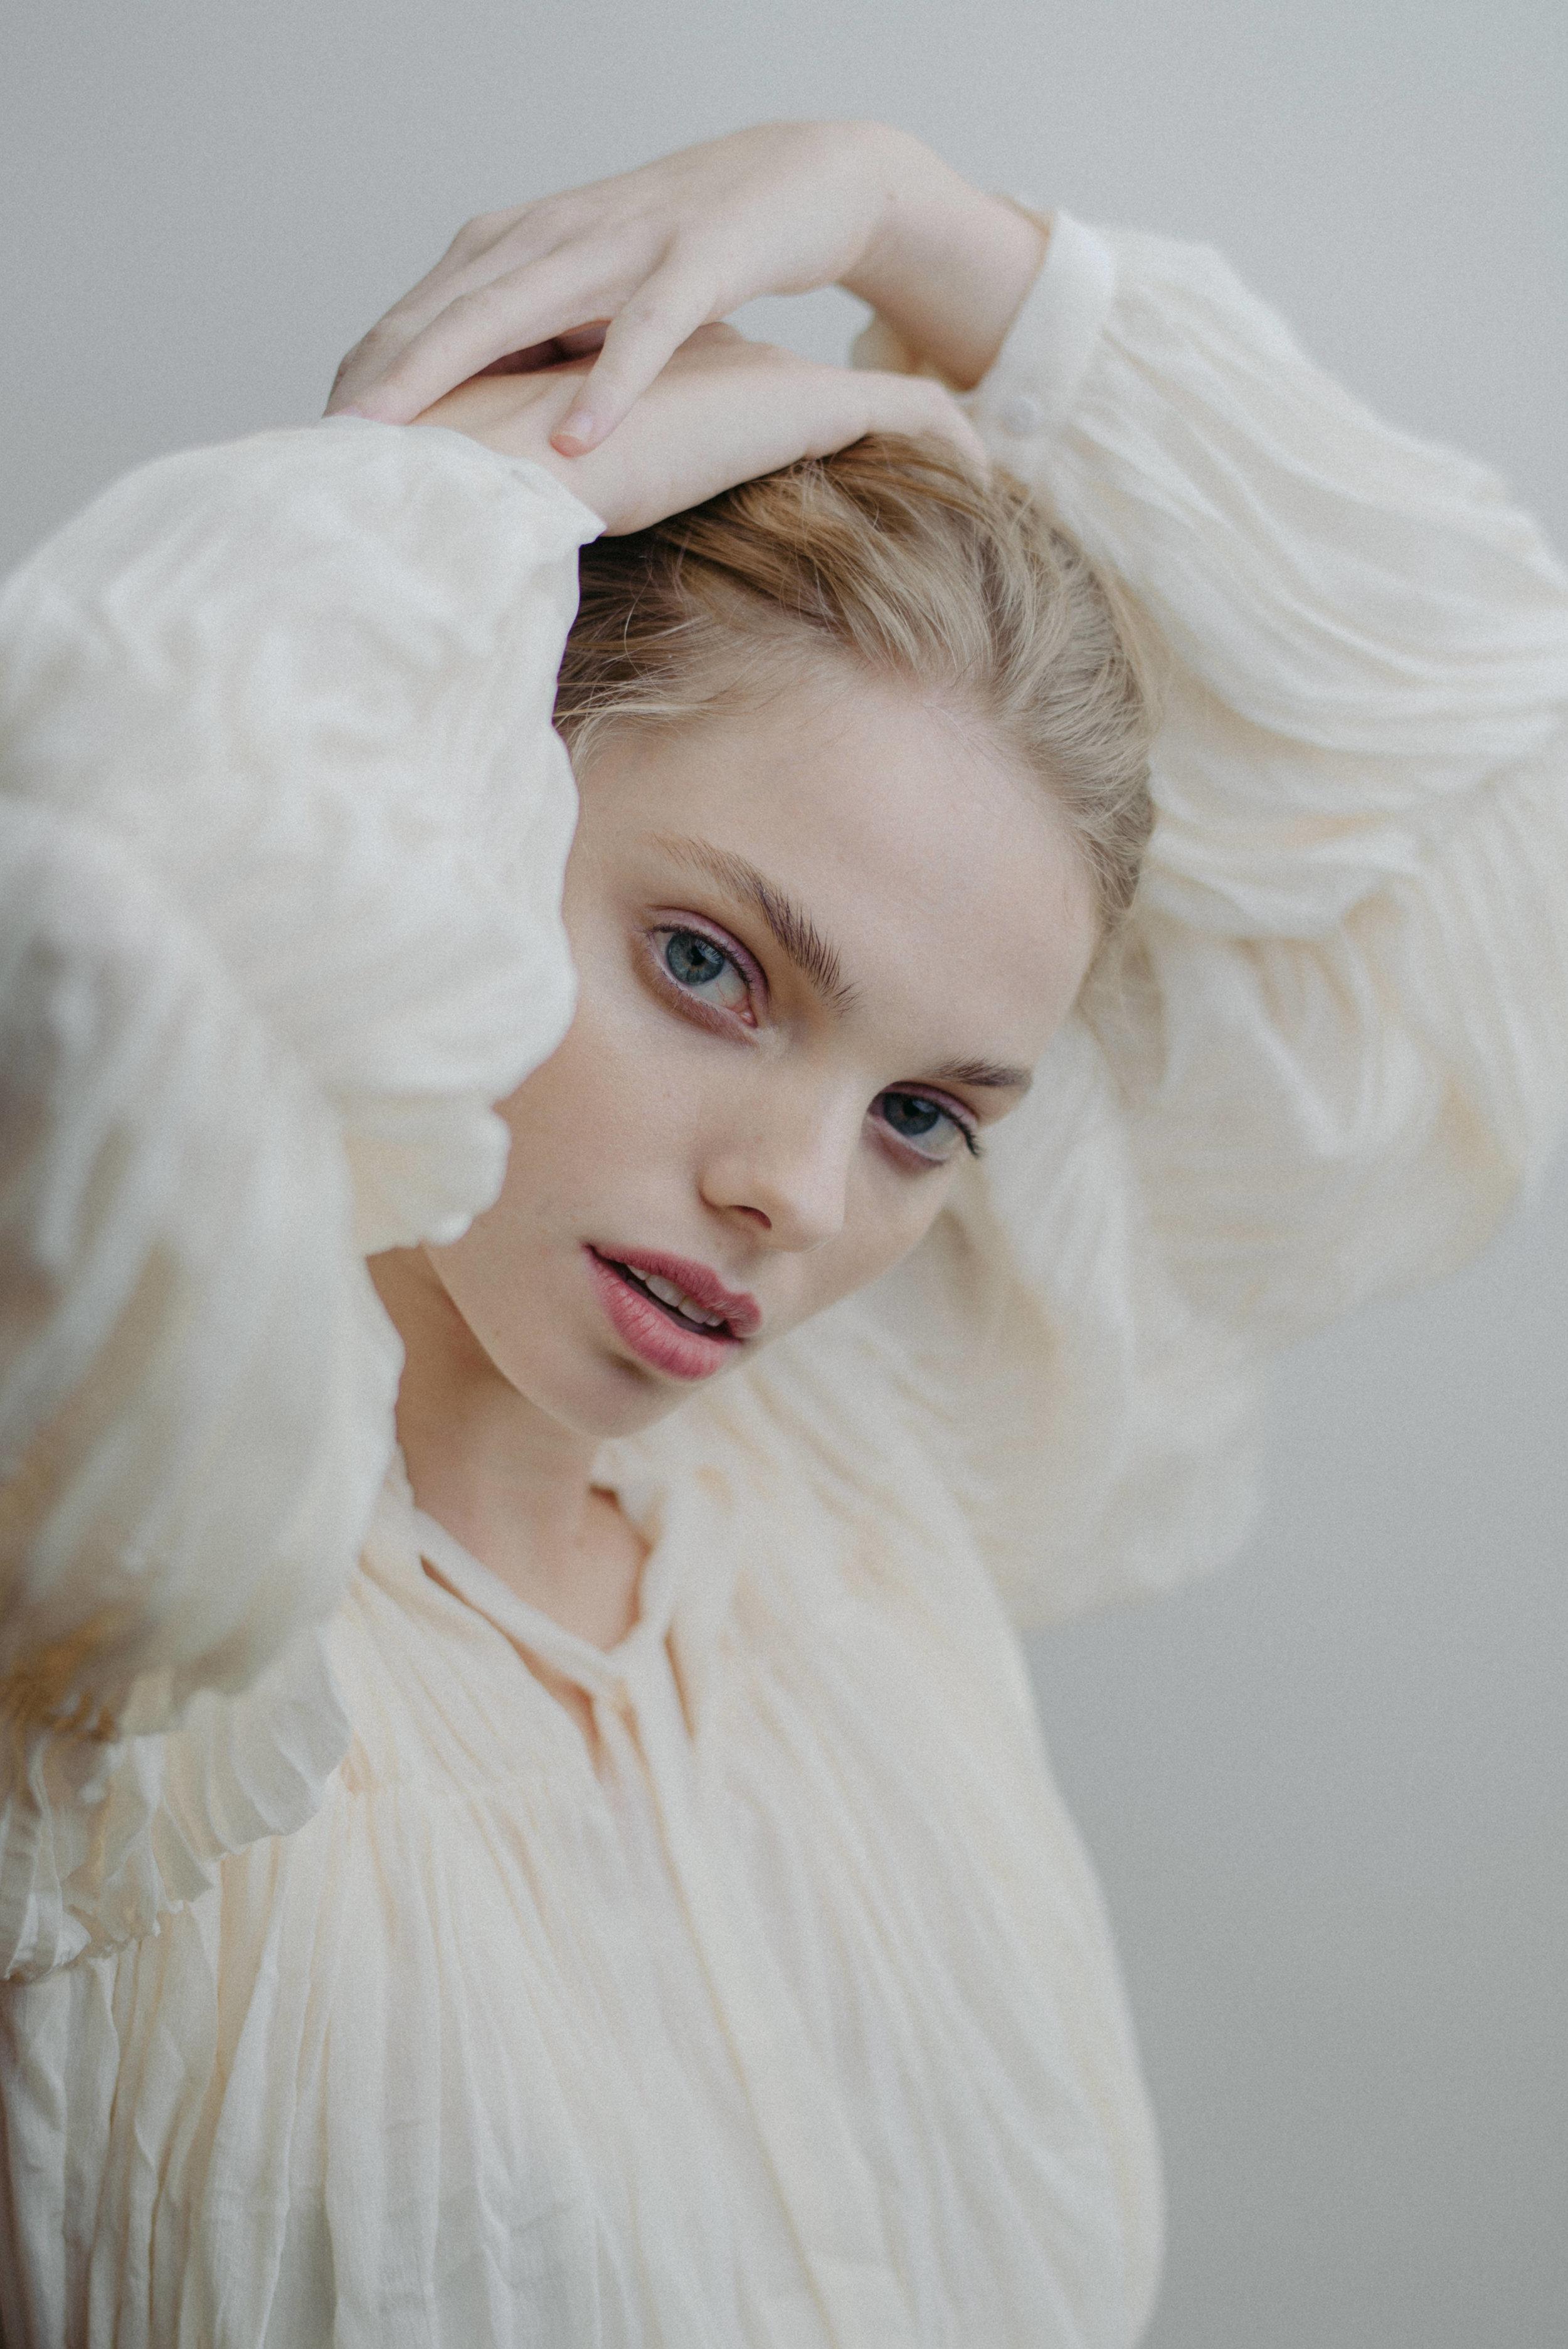 Grace-AMAX-NicolaHarger-075.jpg